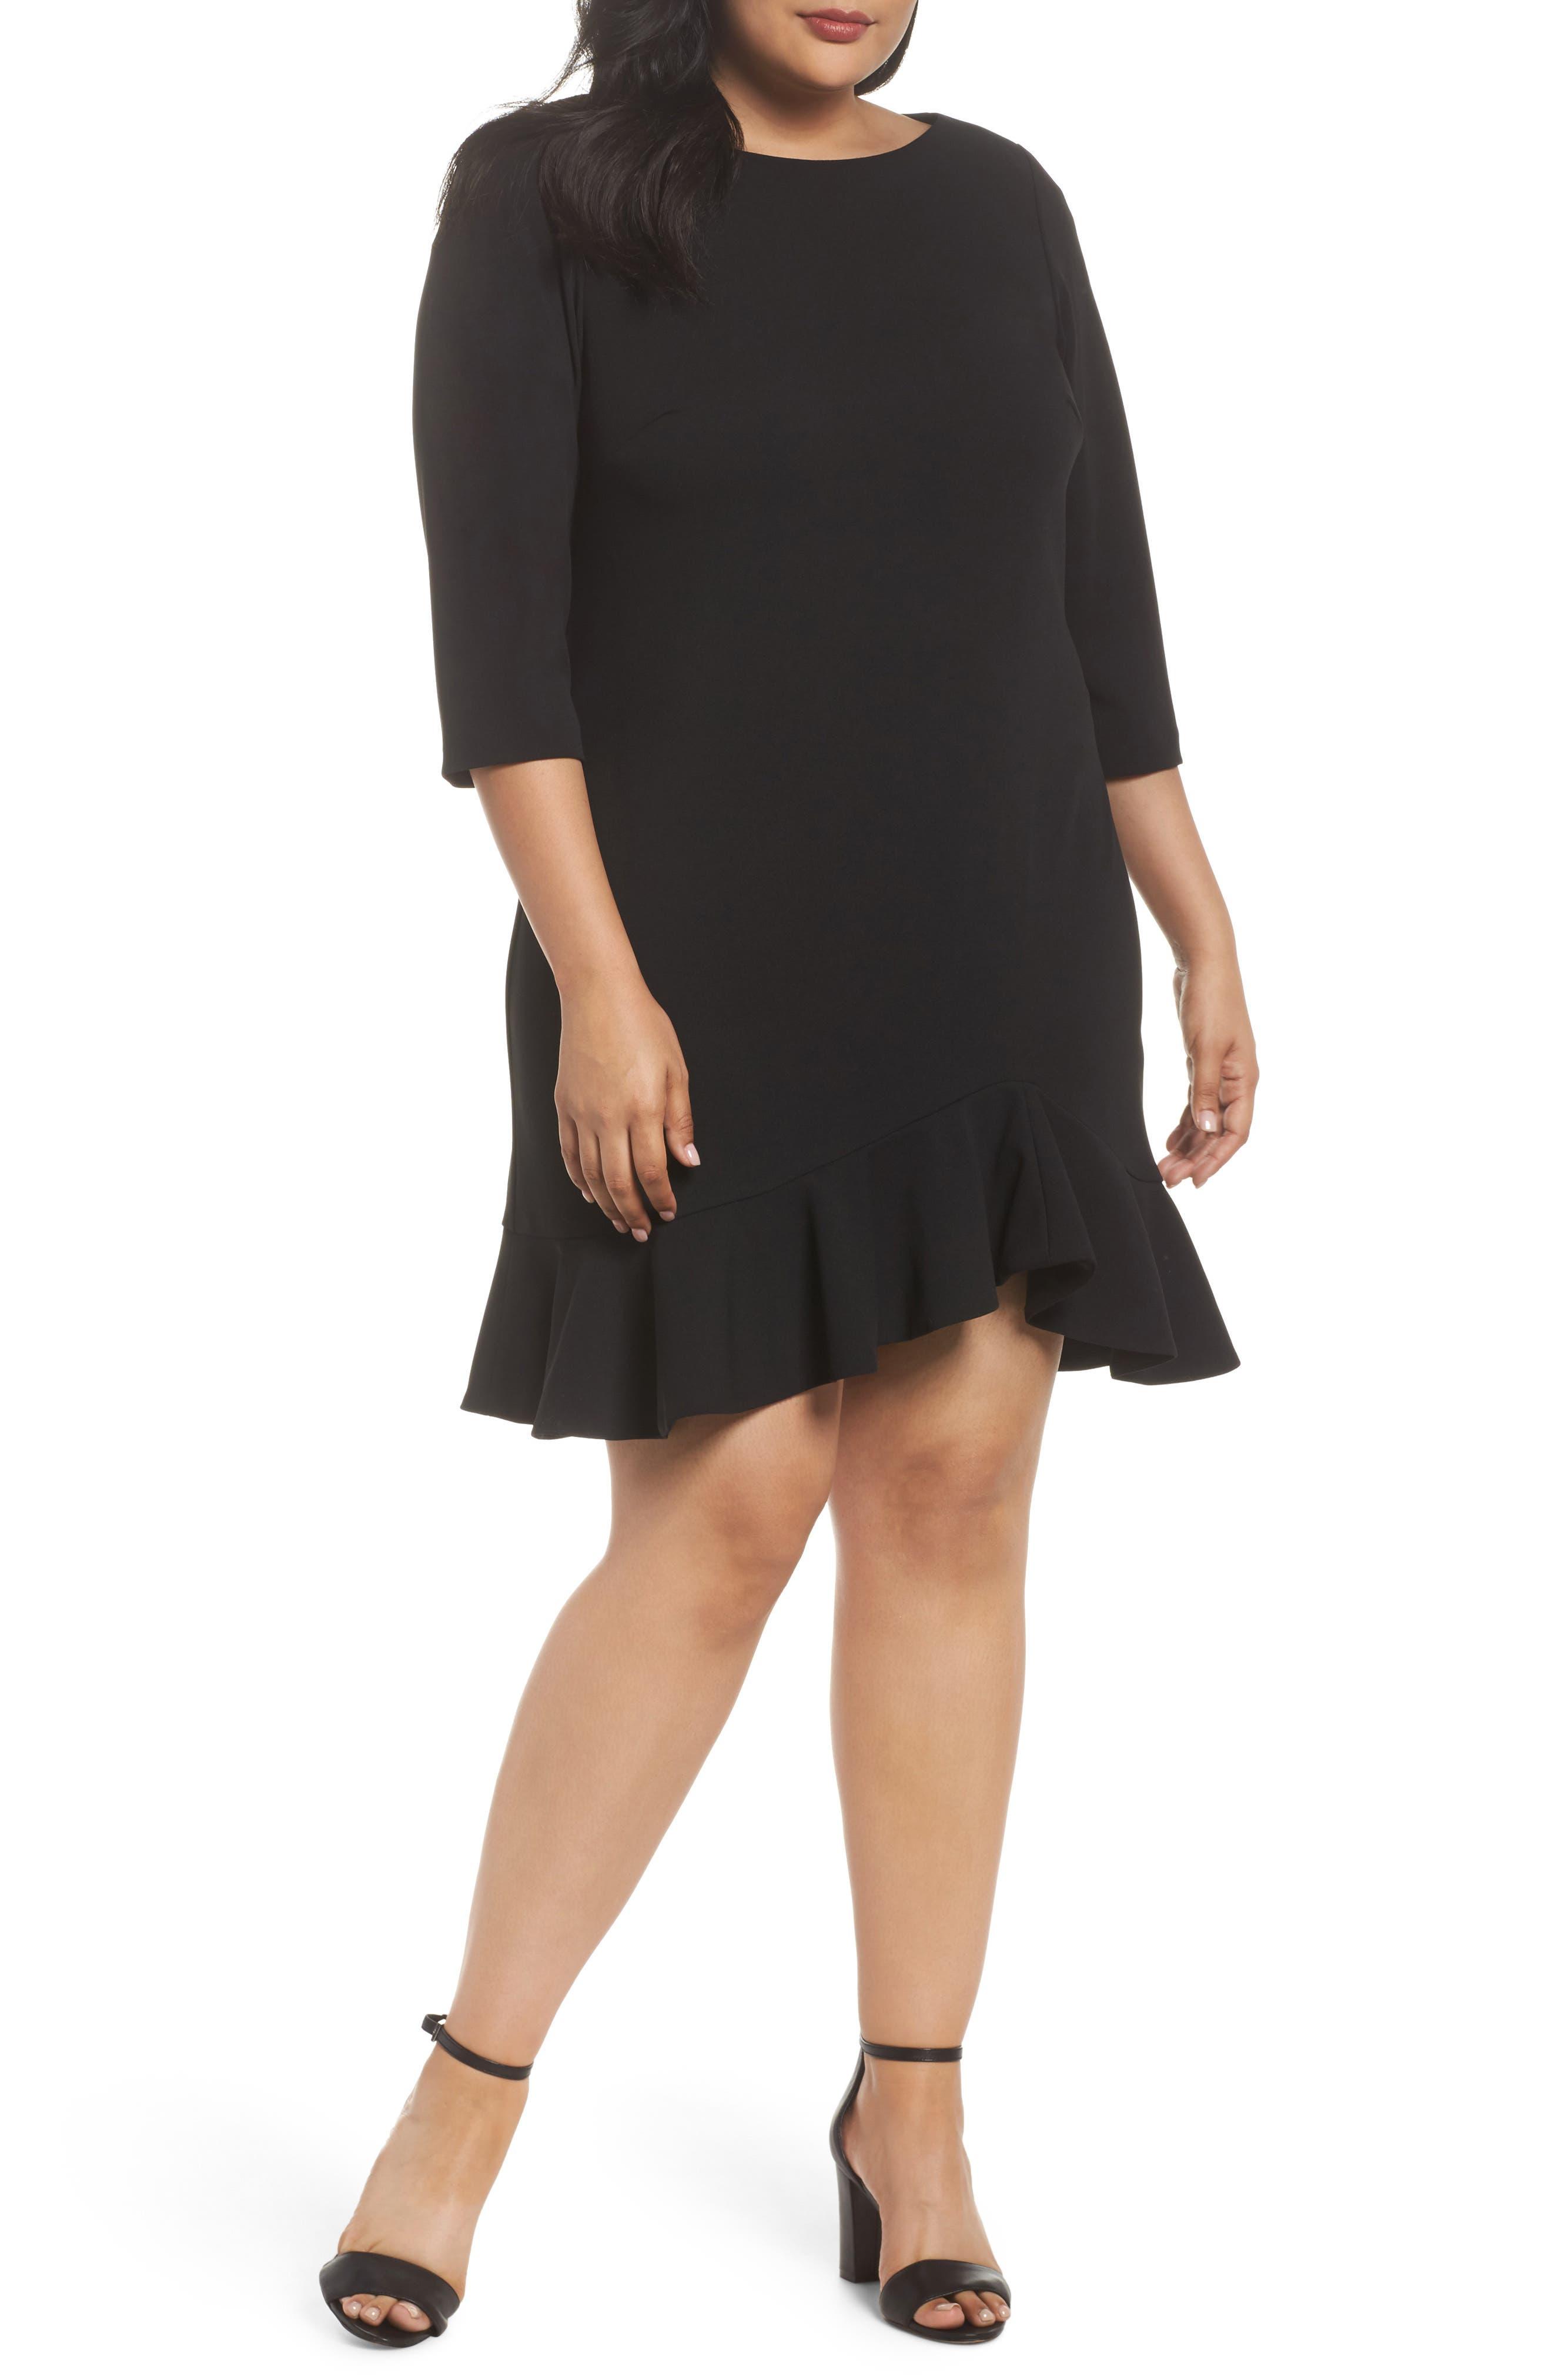 Alternate Image 1 Selected - Vince Camuto Scuba Crepe Sheath Dress (Plus Size)